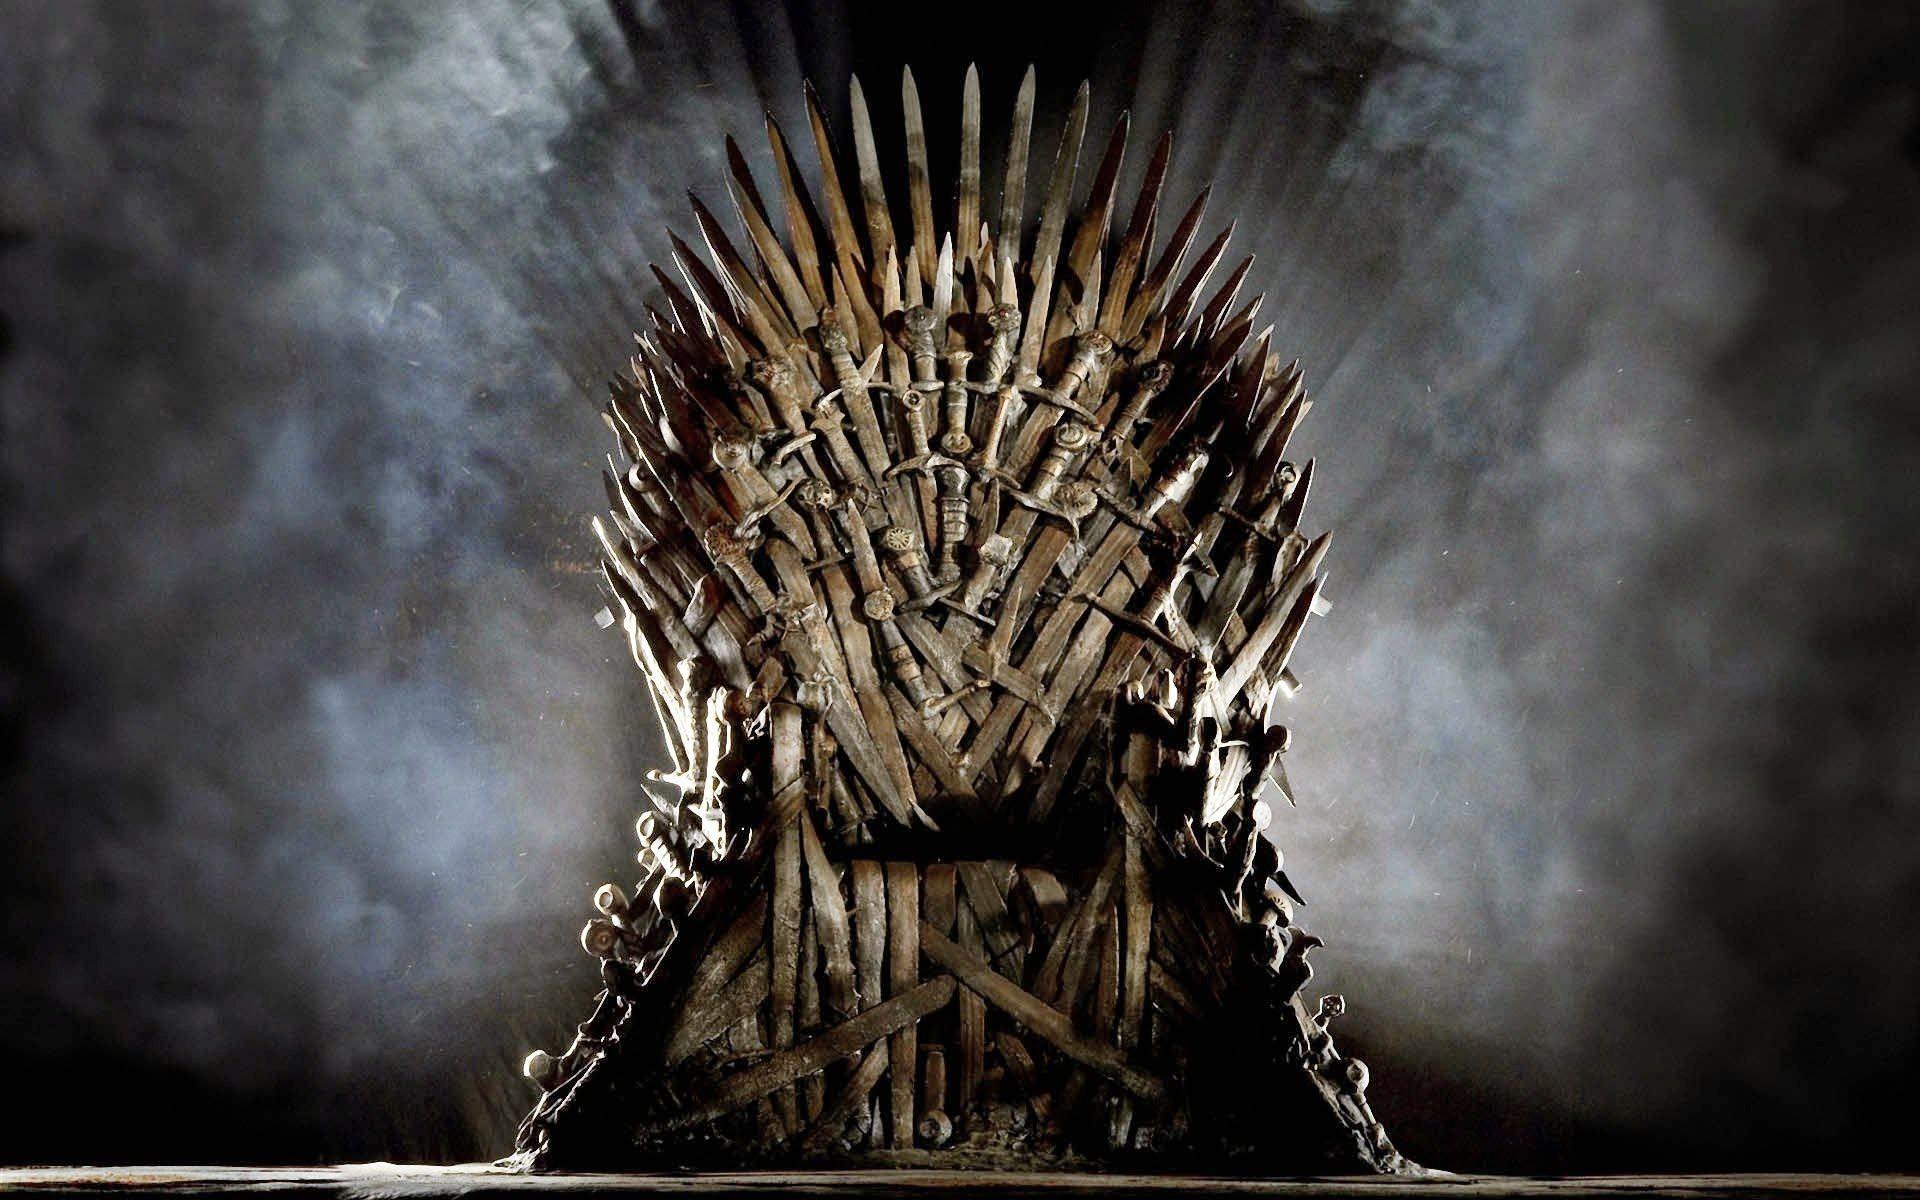 4k Ultra Hd Game Thrones Wallpapers Game Of Thrones Seat Of Power 1920x1200 Download Hd Wallpaper Wallpapertip